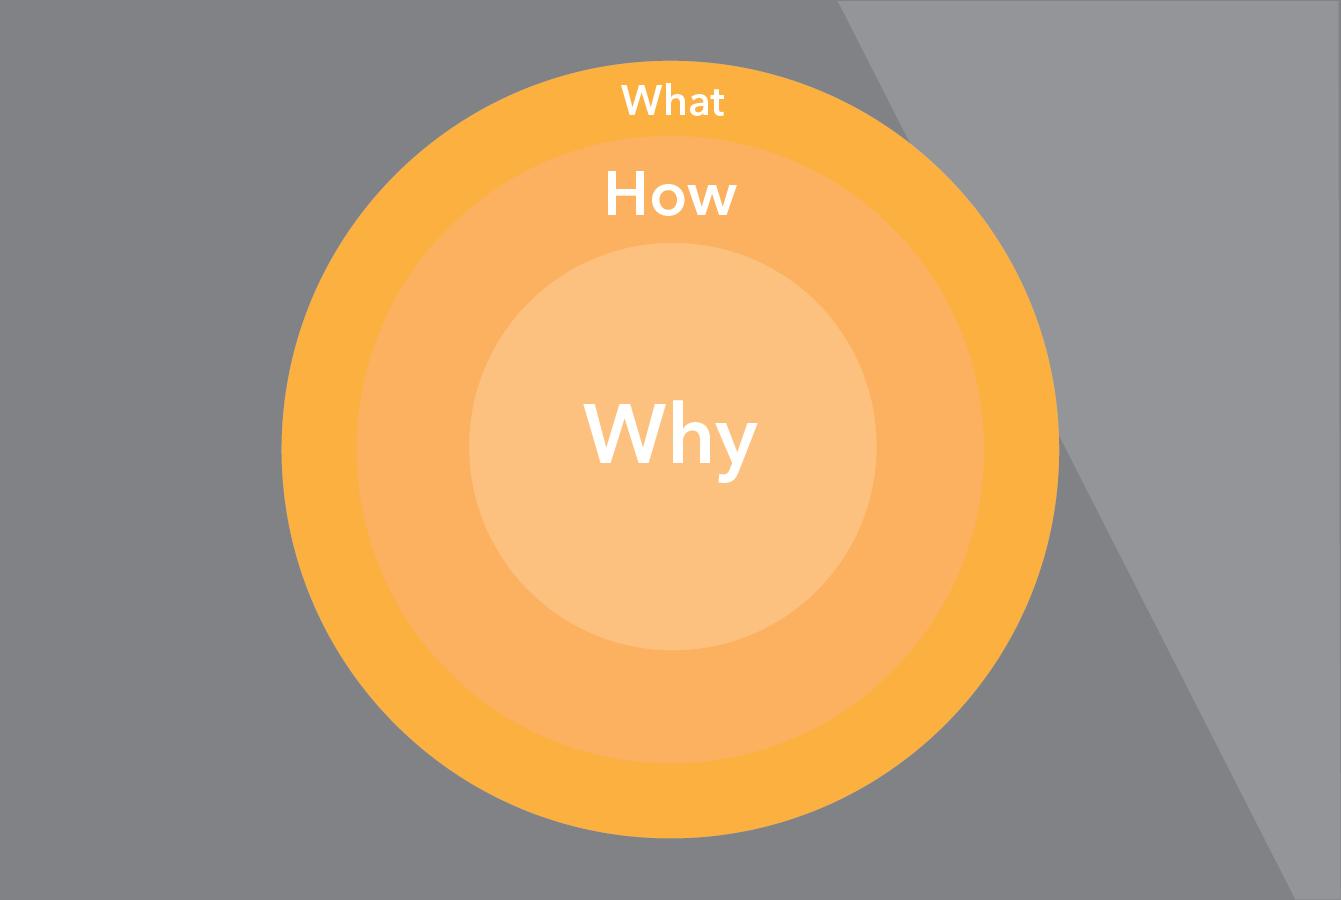 pet-business-marketing-guide-marketing-plan-golden-circle.png